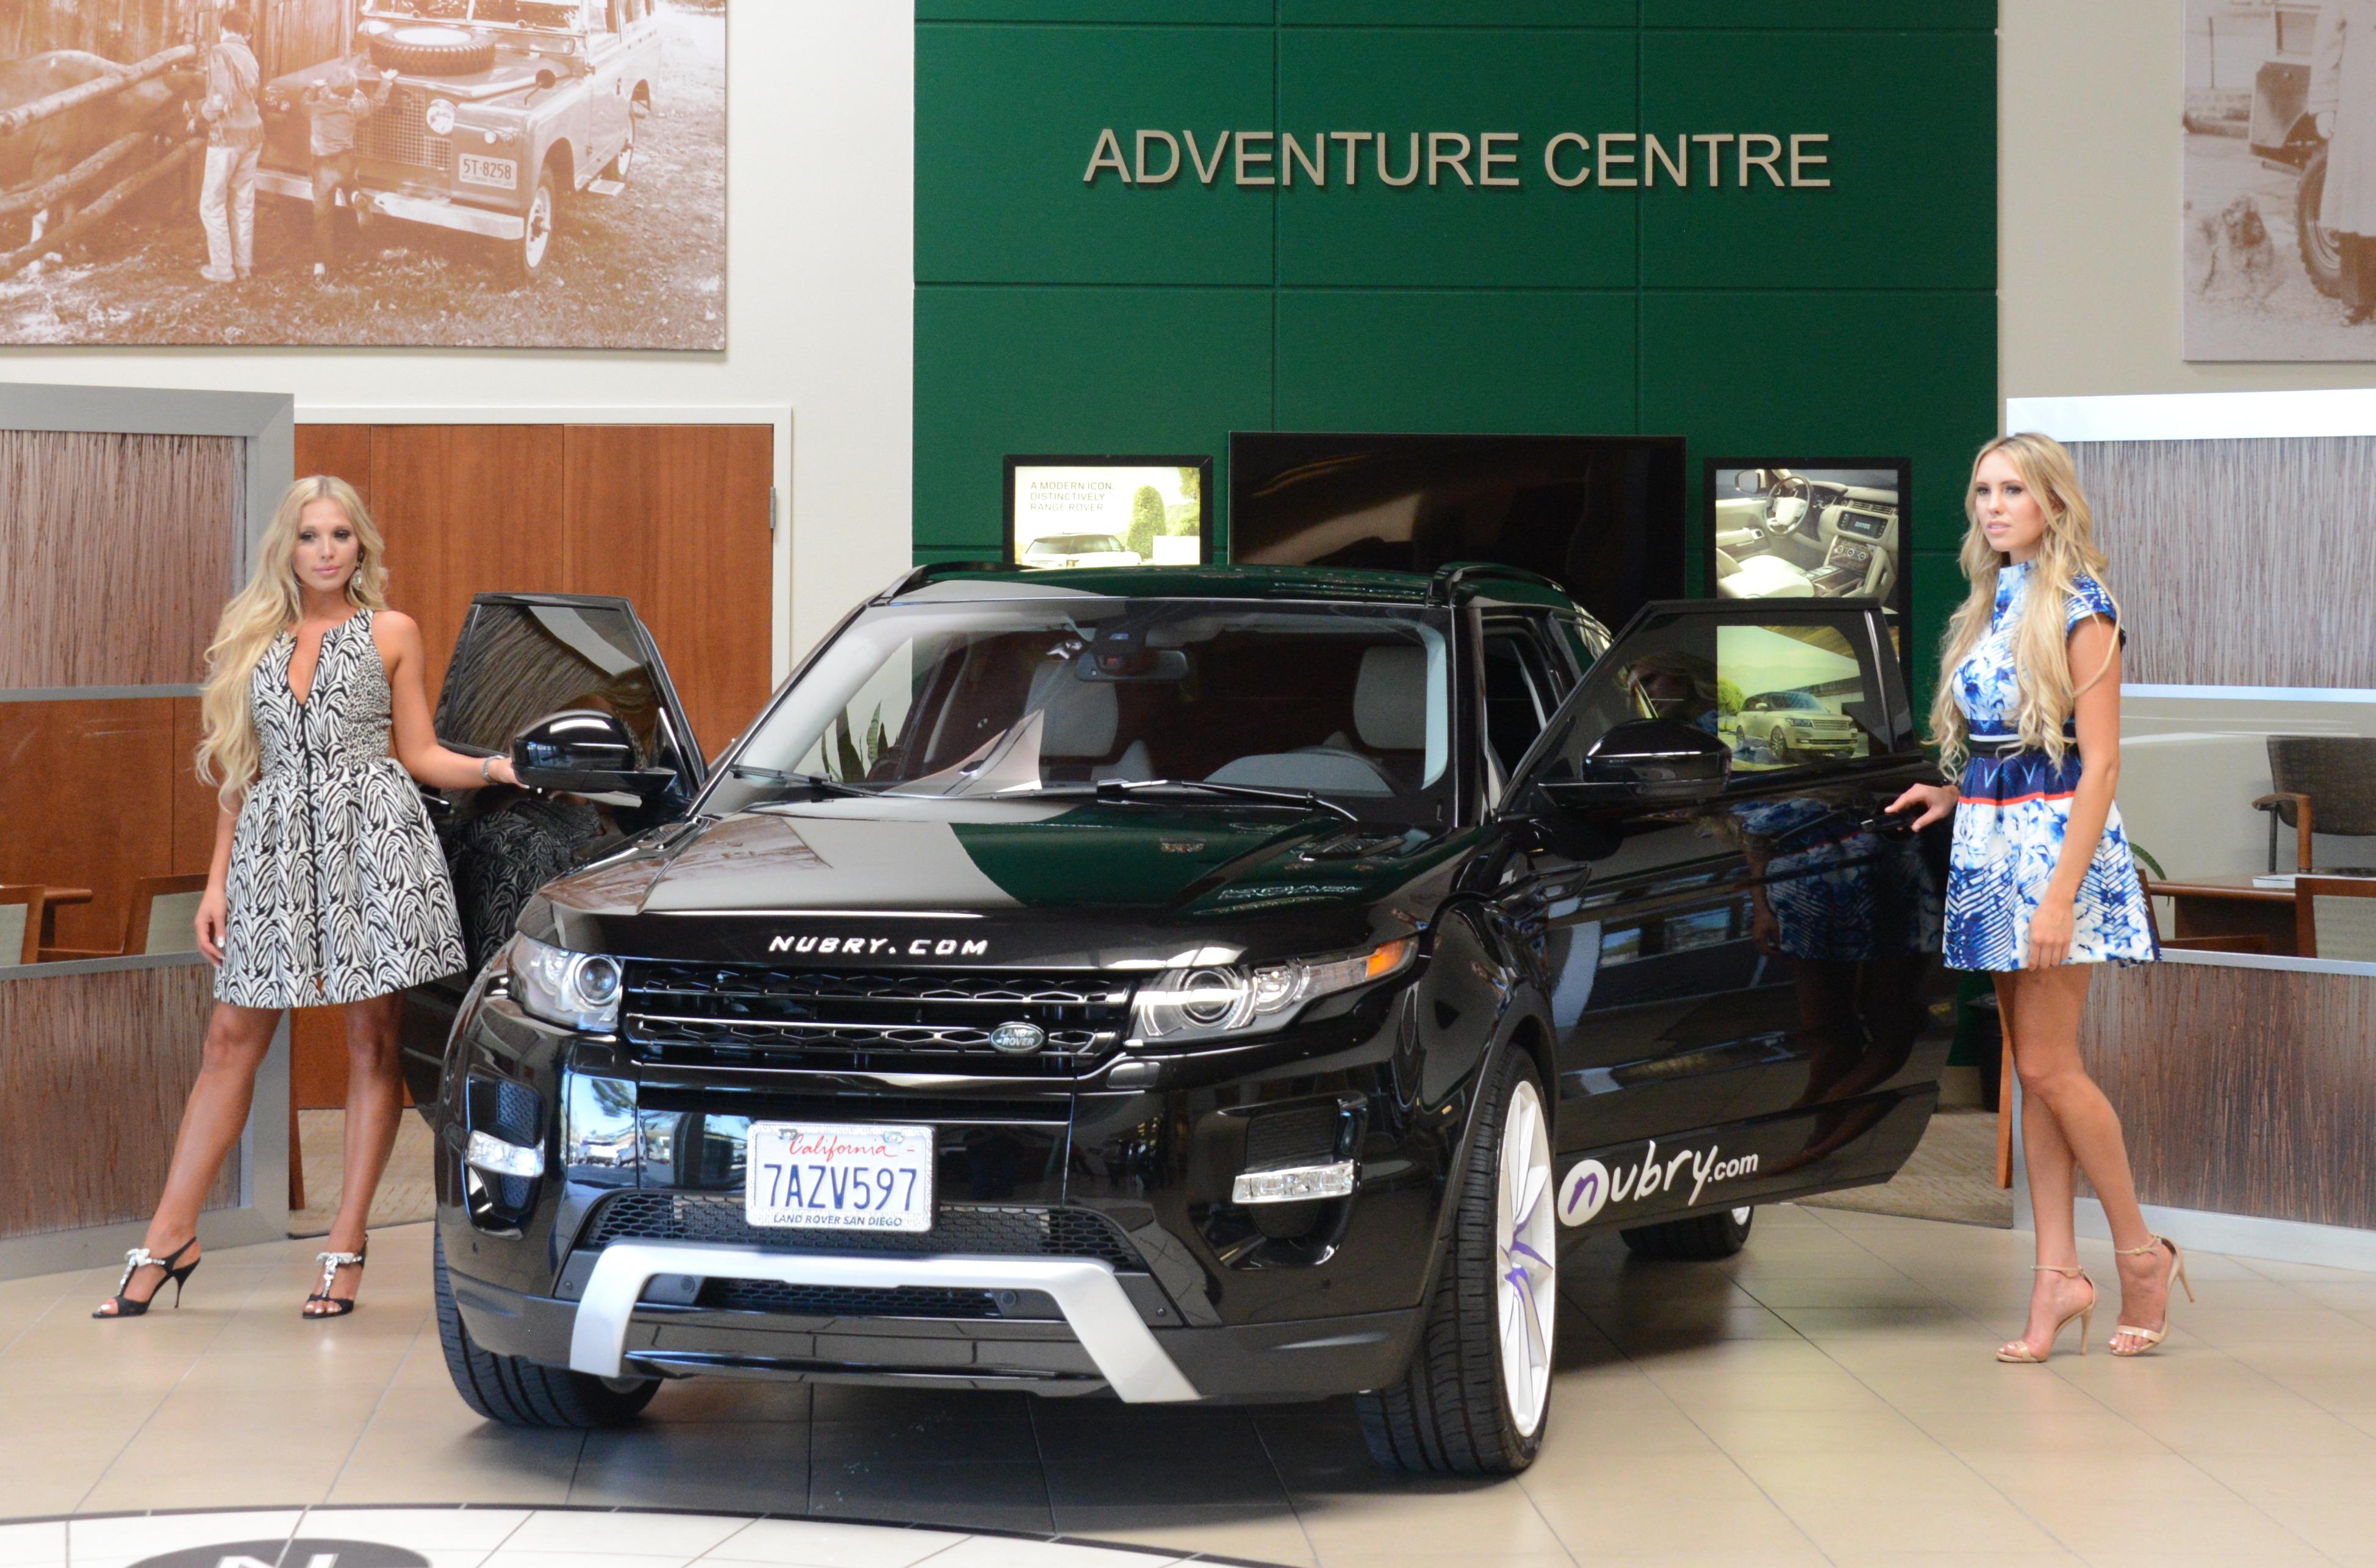 Range Rover San Diego >> Range Rover Evoque Customized By Nubry Land Rover San Diego